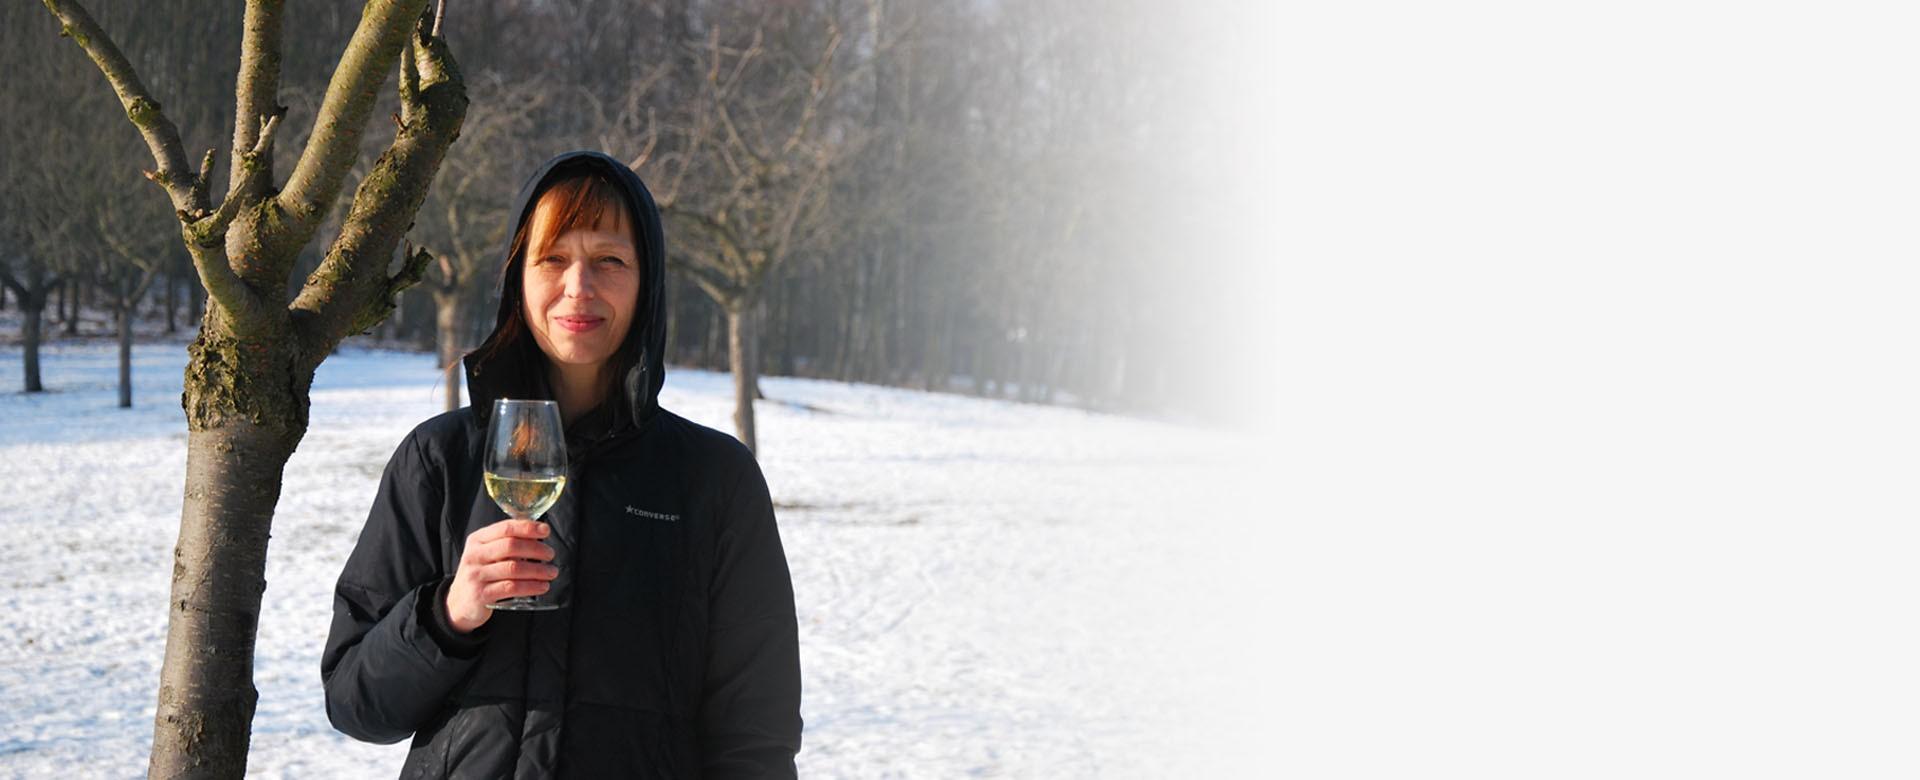 Rozhovor s Babe LN pro www.nevinnyobchod.cz